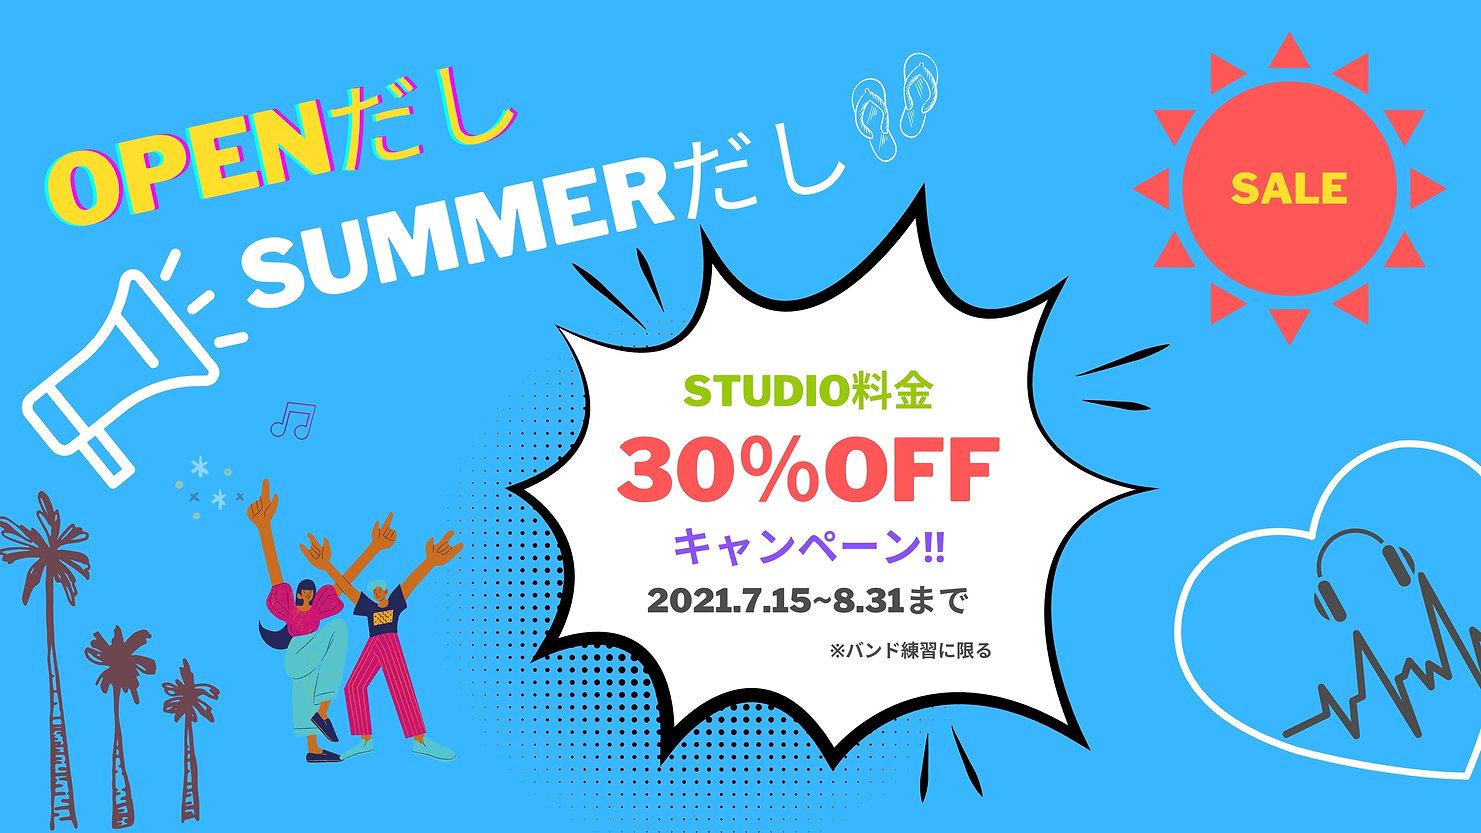 OPENだしのコピー (2).jpg